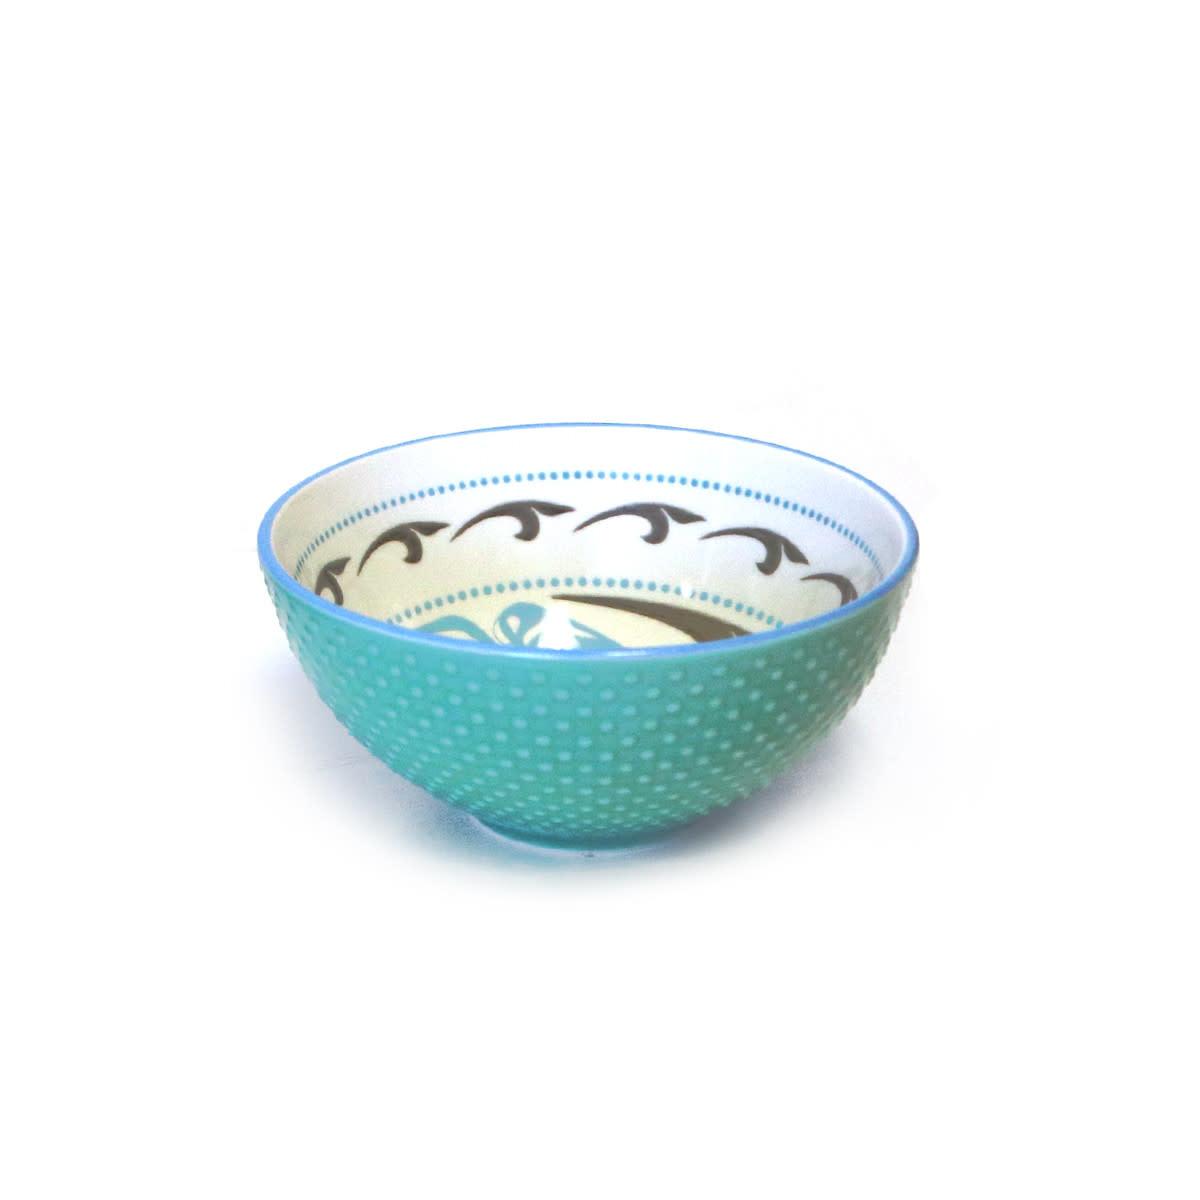 Porcelain Art Bowl - Small-5